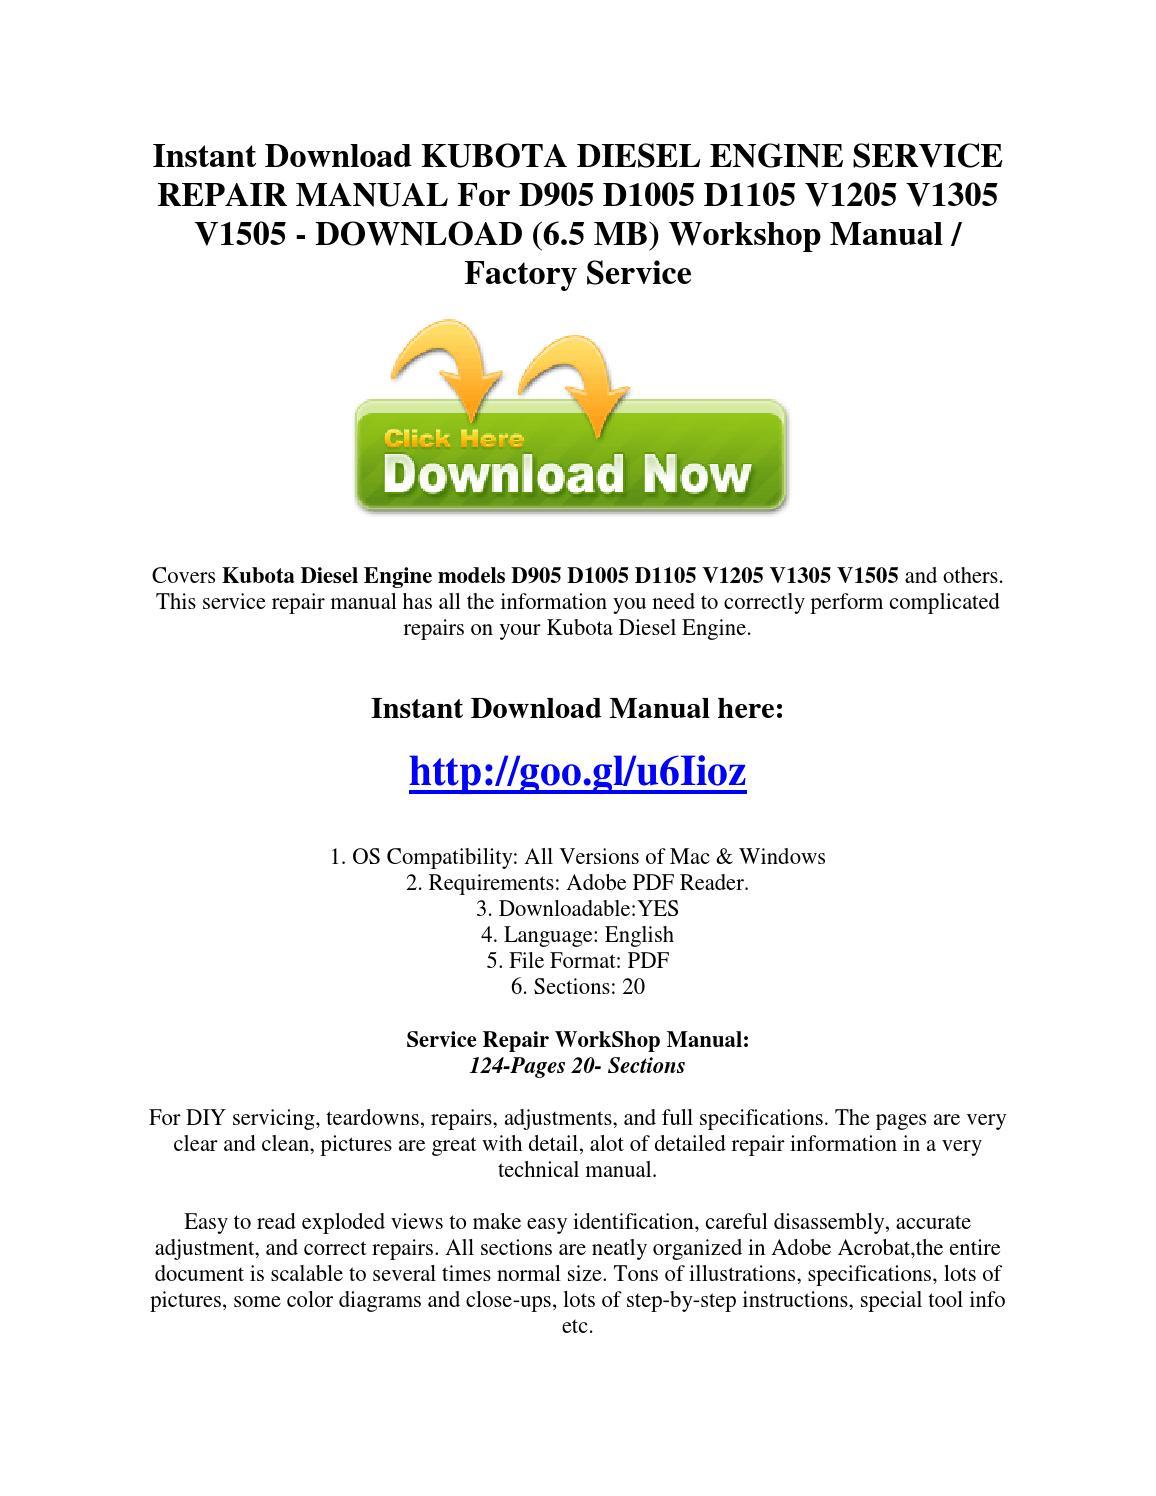 Kubota V1505 Engine Diagram Expert Schematics Diesel Diagrams Instant Download Service Repair Manual For D905 Injection Pump